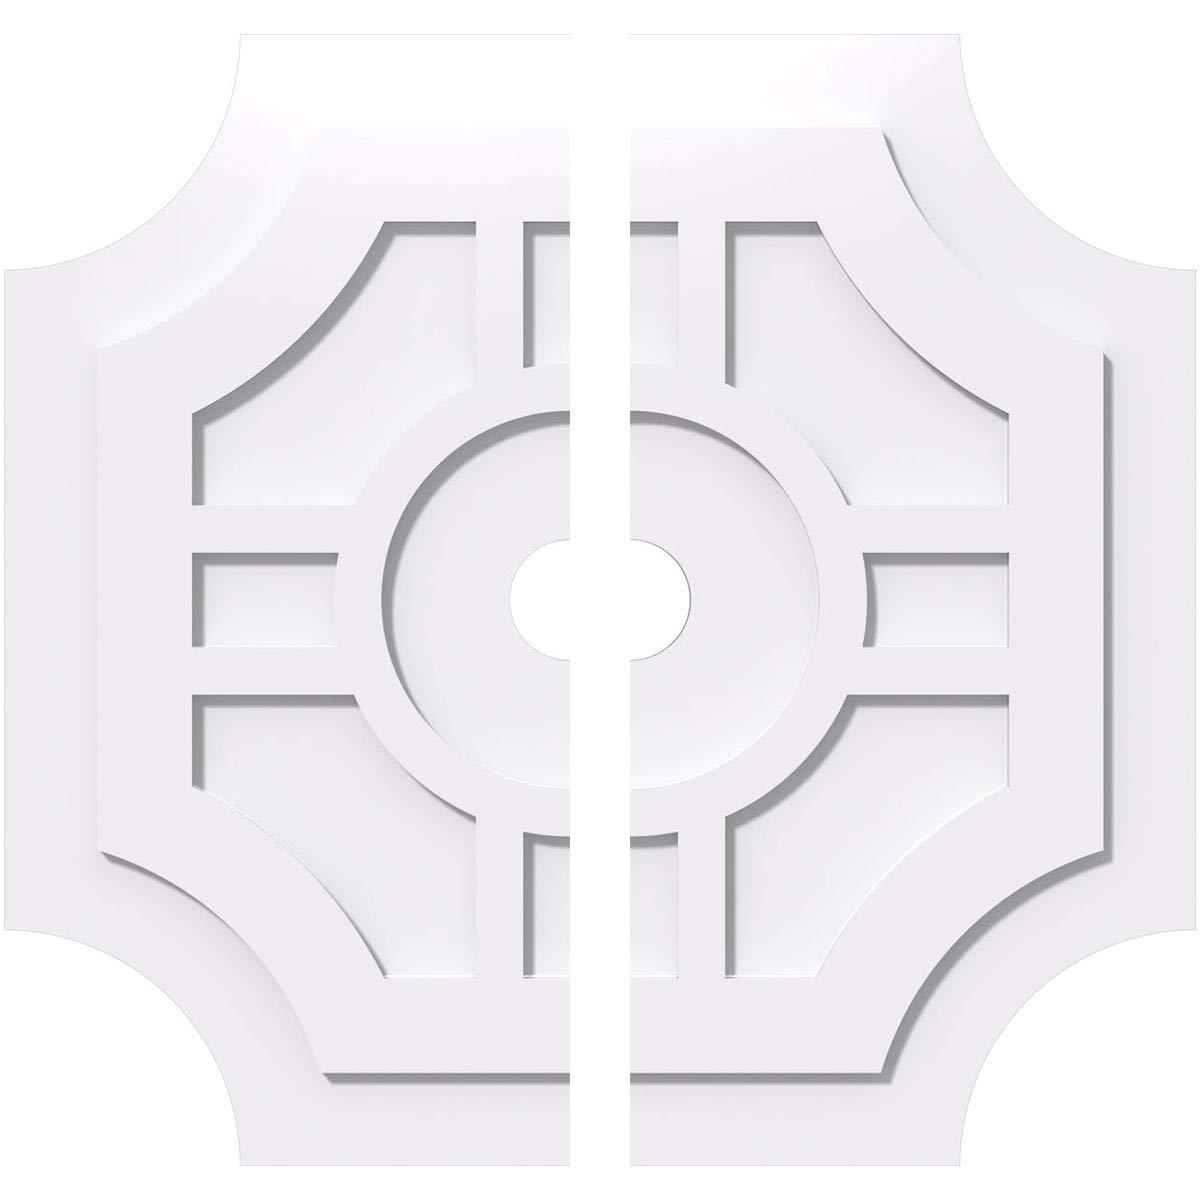 Ekena Millwork CMP28HS2-03000 Ceiling Medallion, 28''OD x 3''ID x 9 1/4''C x 1''P, White by Ekena Millwork